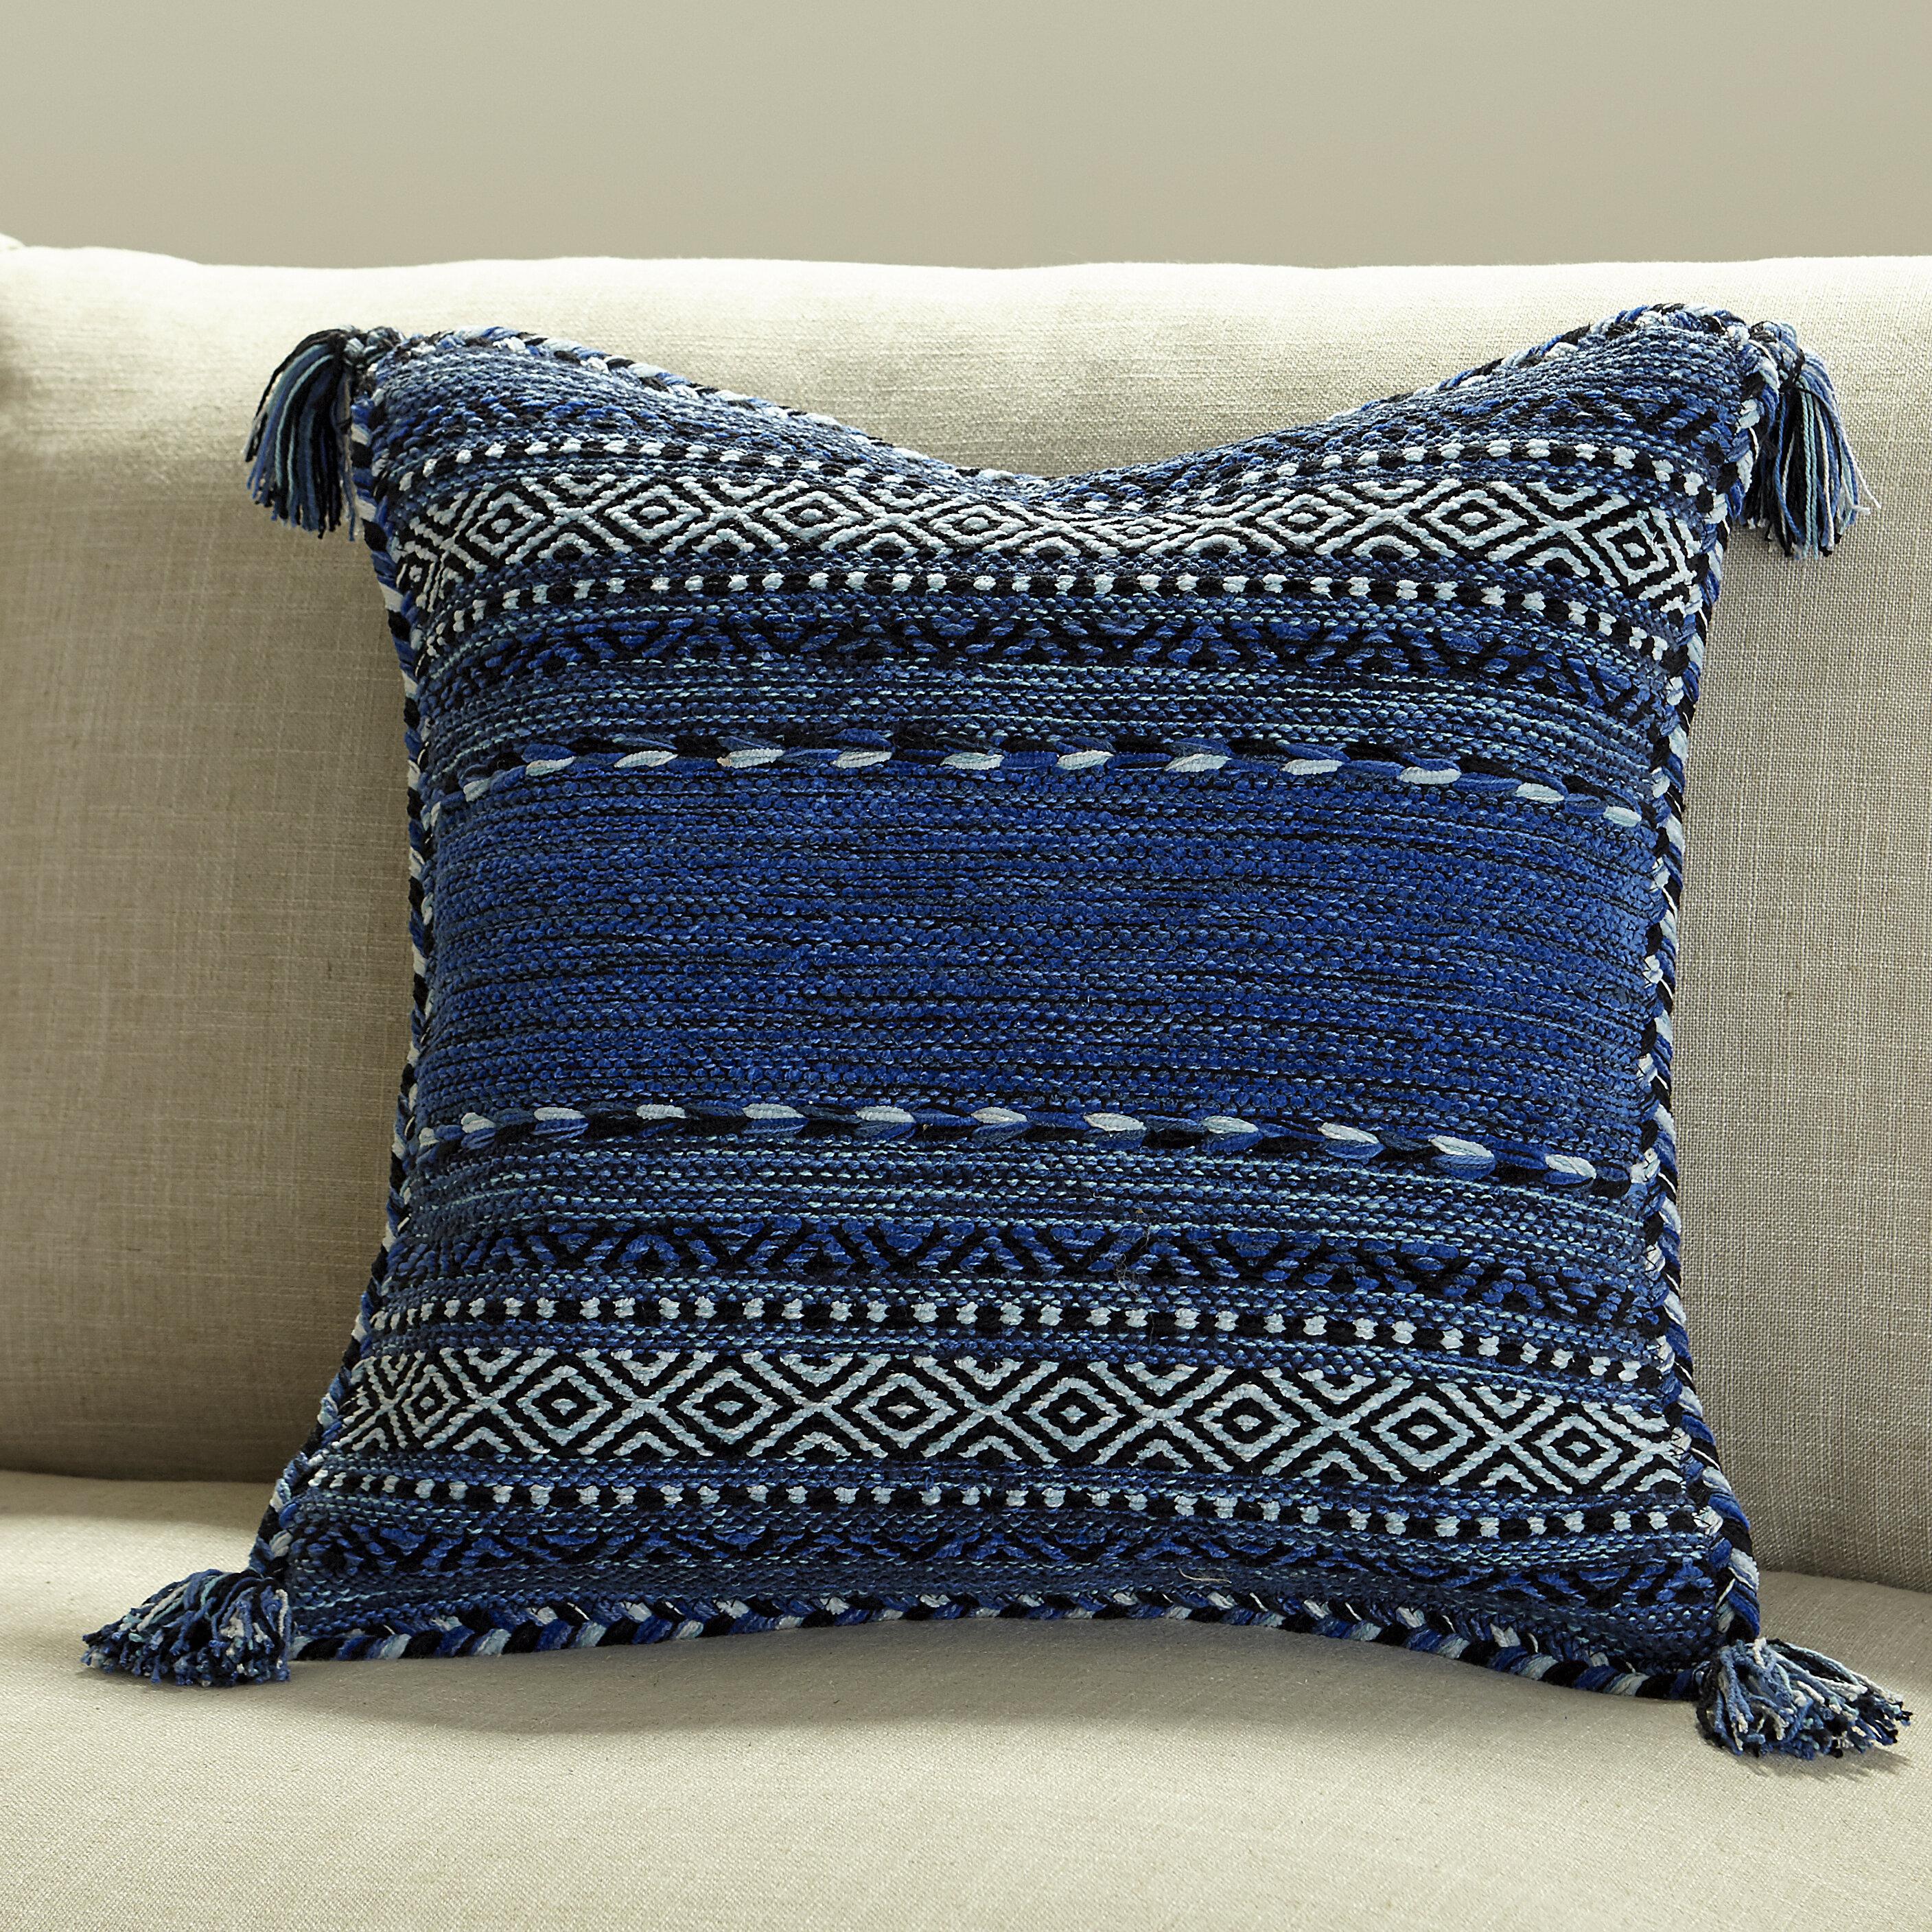 Blue Throw Pillows Free Shipping Over 35 Wayfair